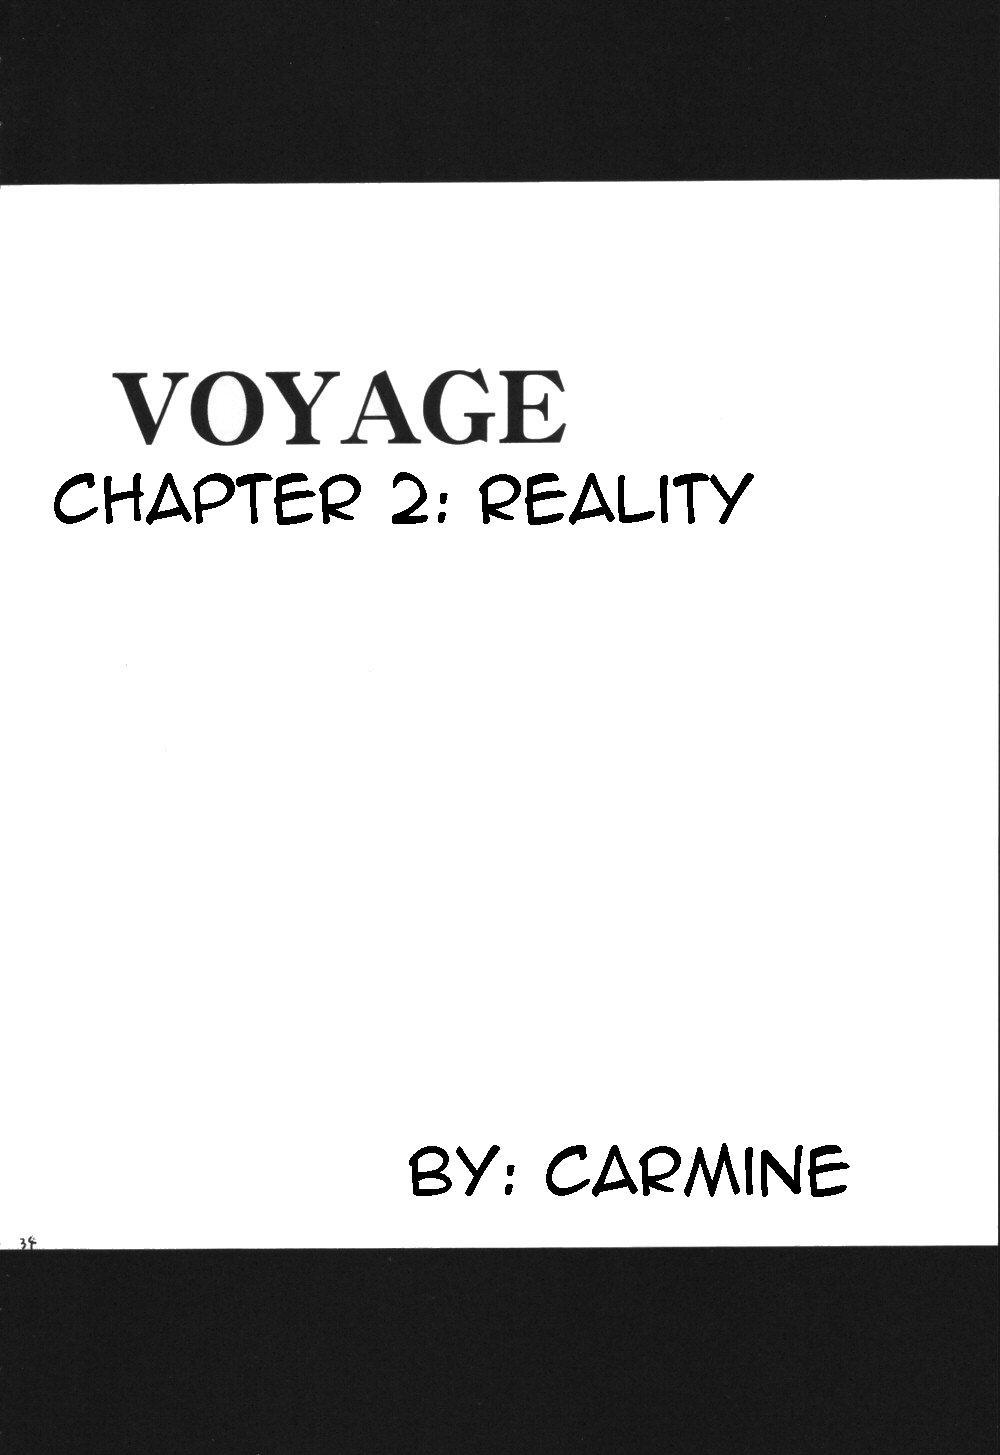 VOYAGE 32